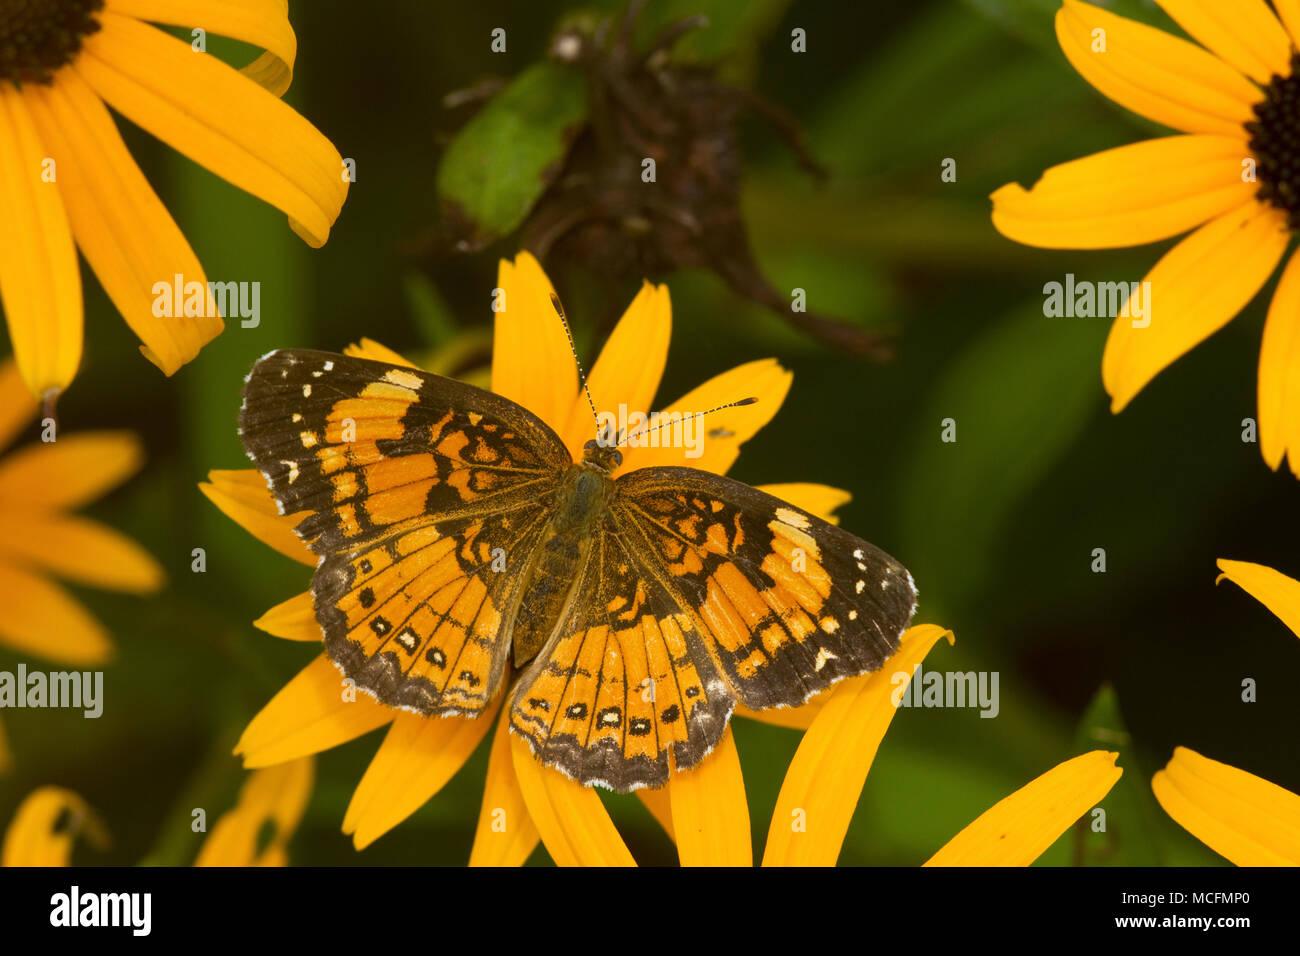 Plateado 03365-00307 Checkerspot butterfly (Chlosyne nycteis) Goldstrum Black-eyed Susans (Rudbeckia hirta 'Goldstrum') Marion Co., IL Foto de stock